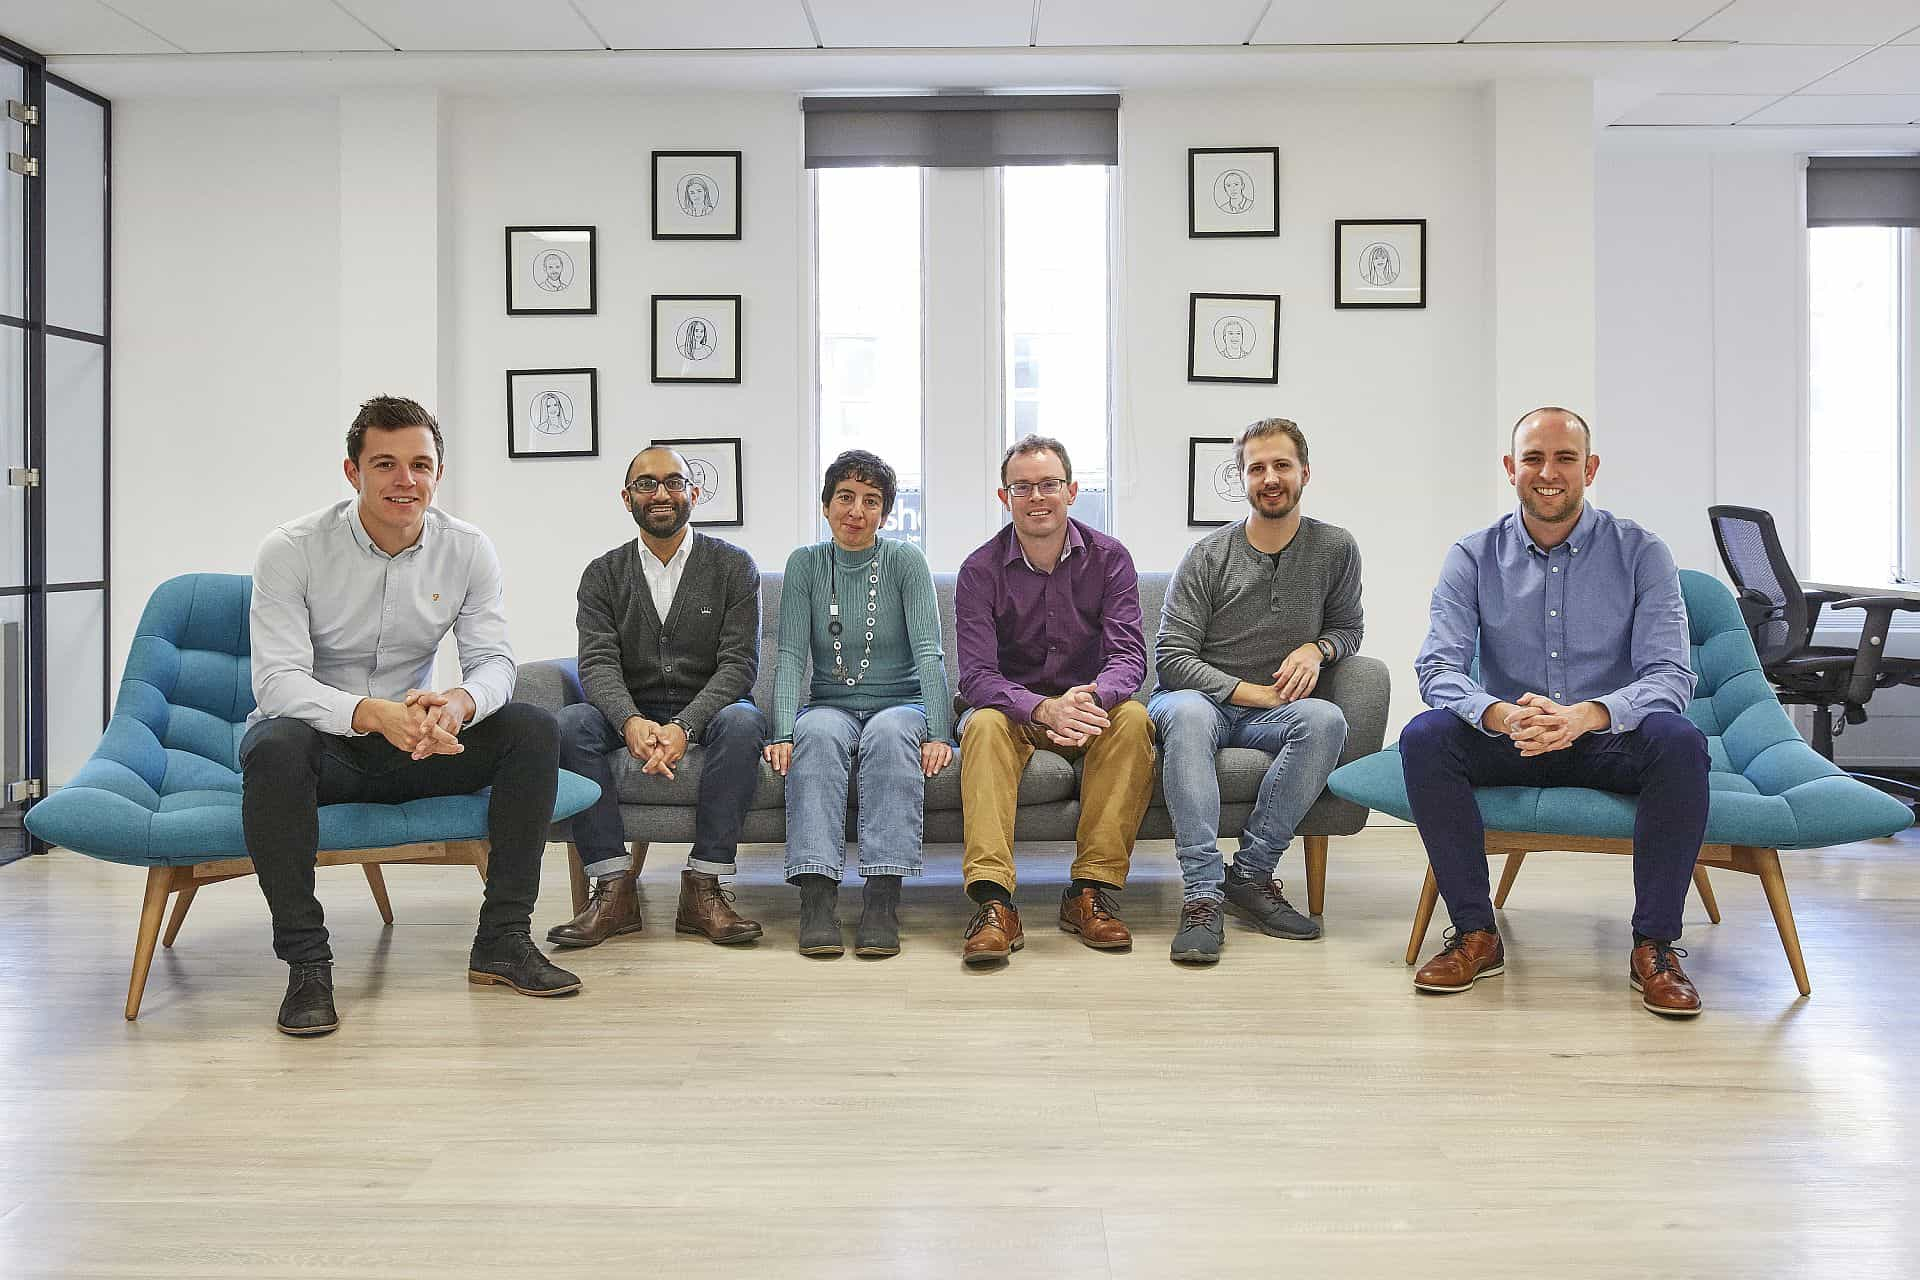 New joiners - Johnny, Sunil, Nina, Peter, Ian and Chris